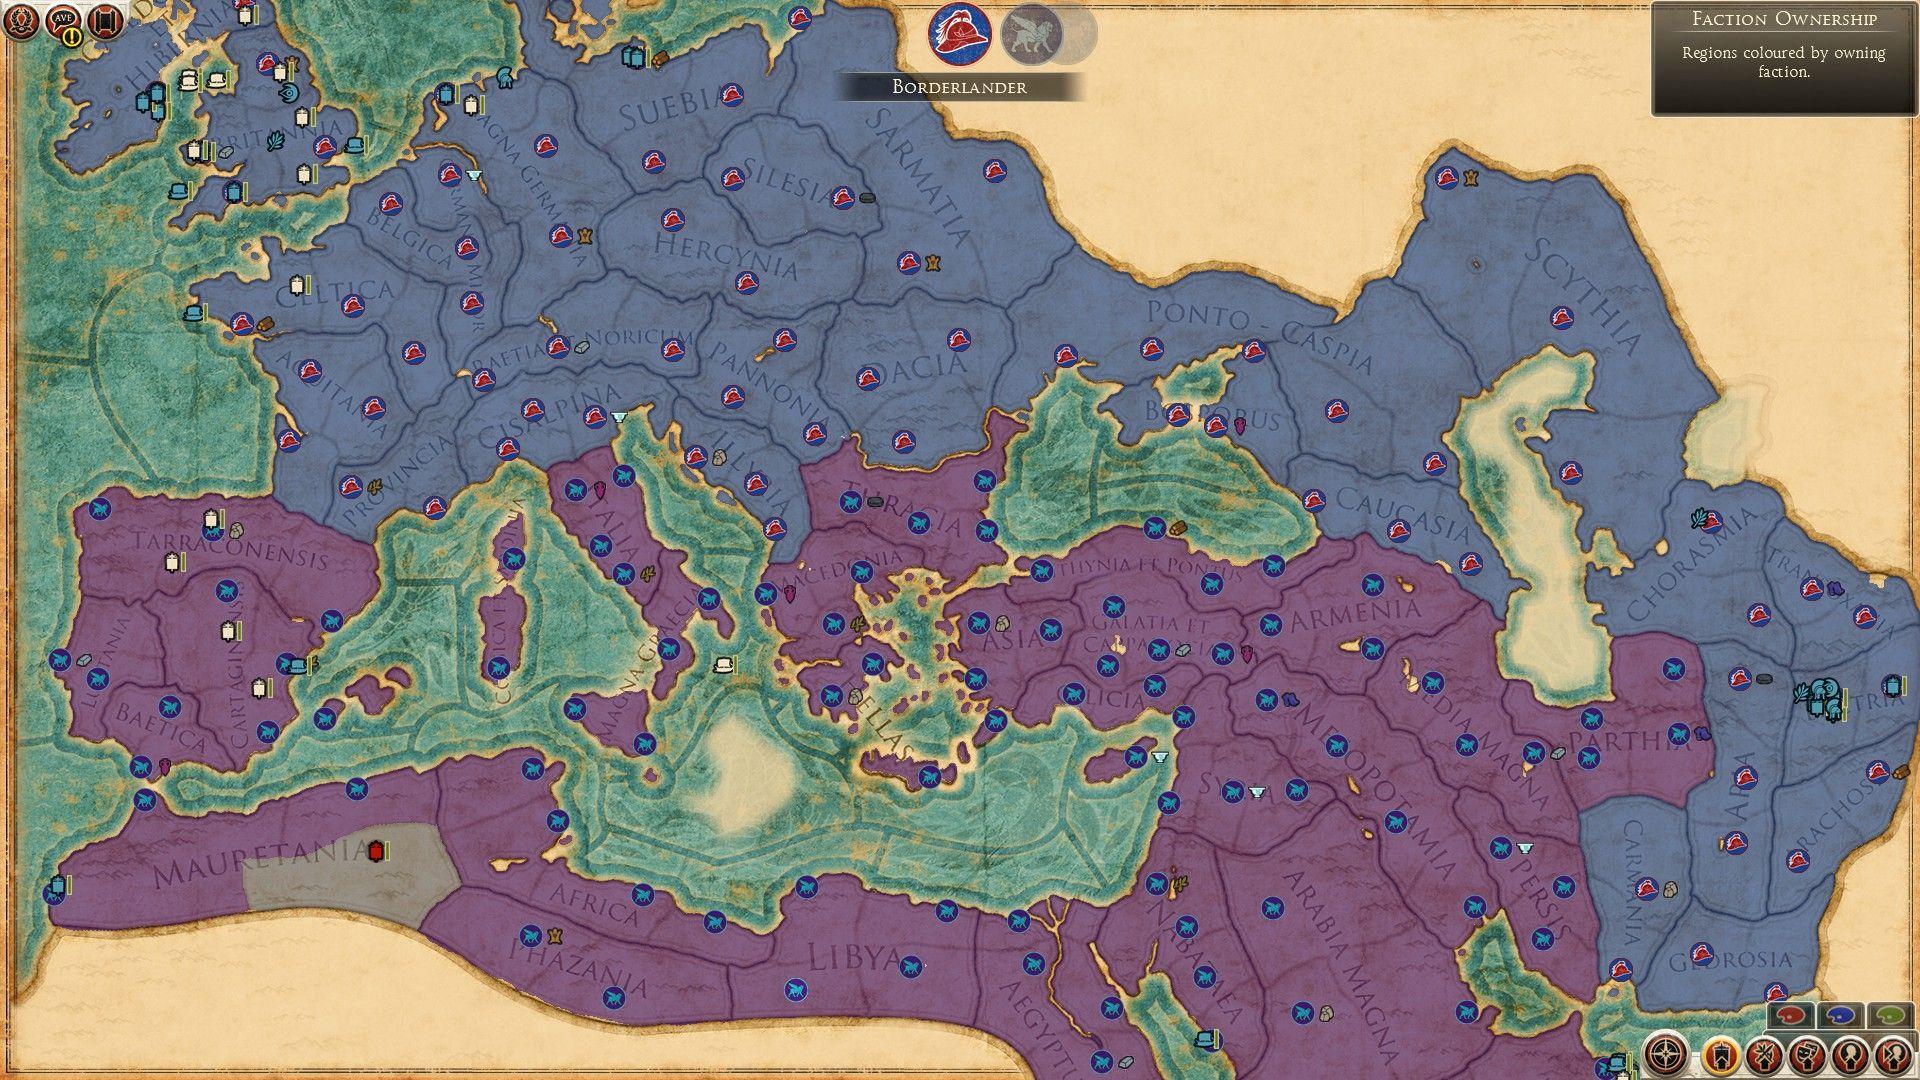 Rule Britannia Caledoni in Empire Divided